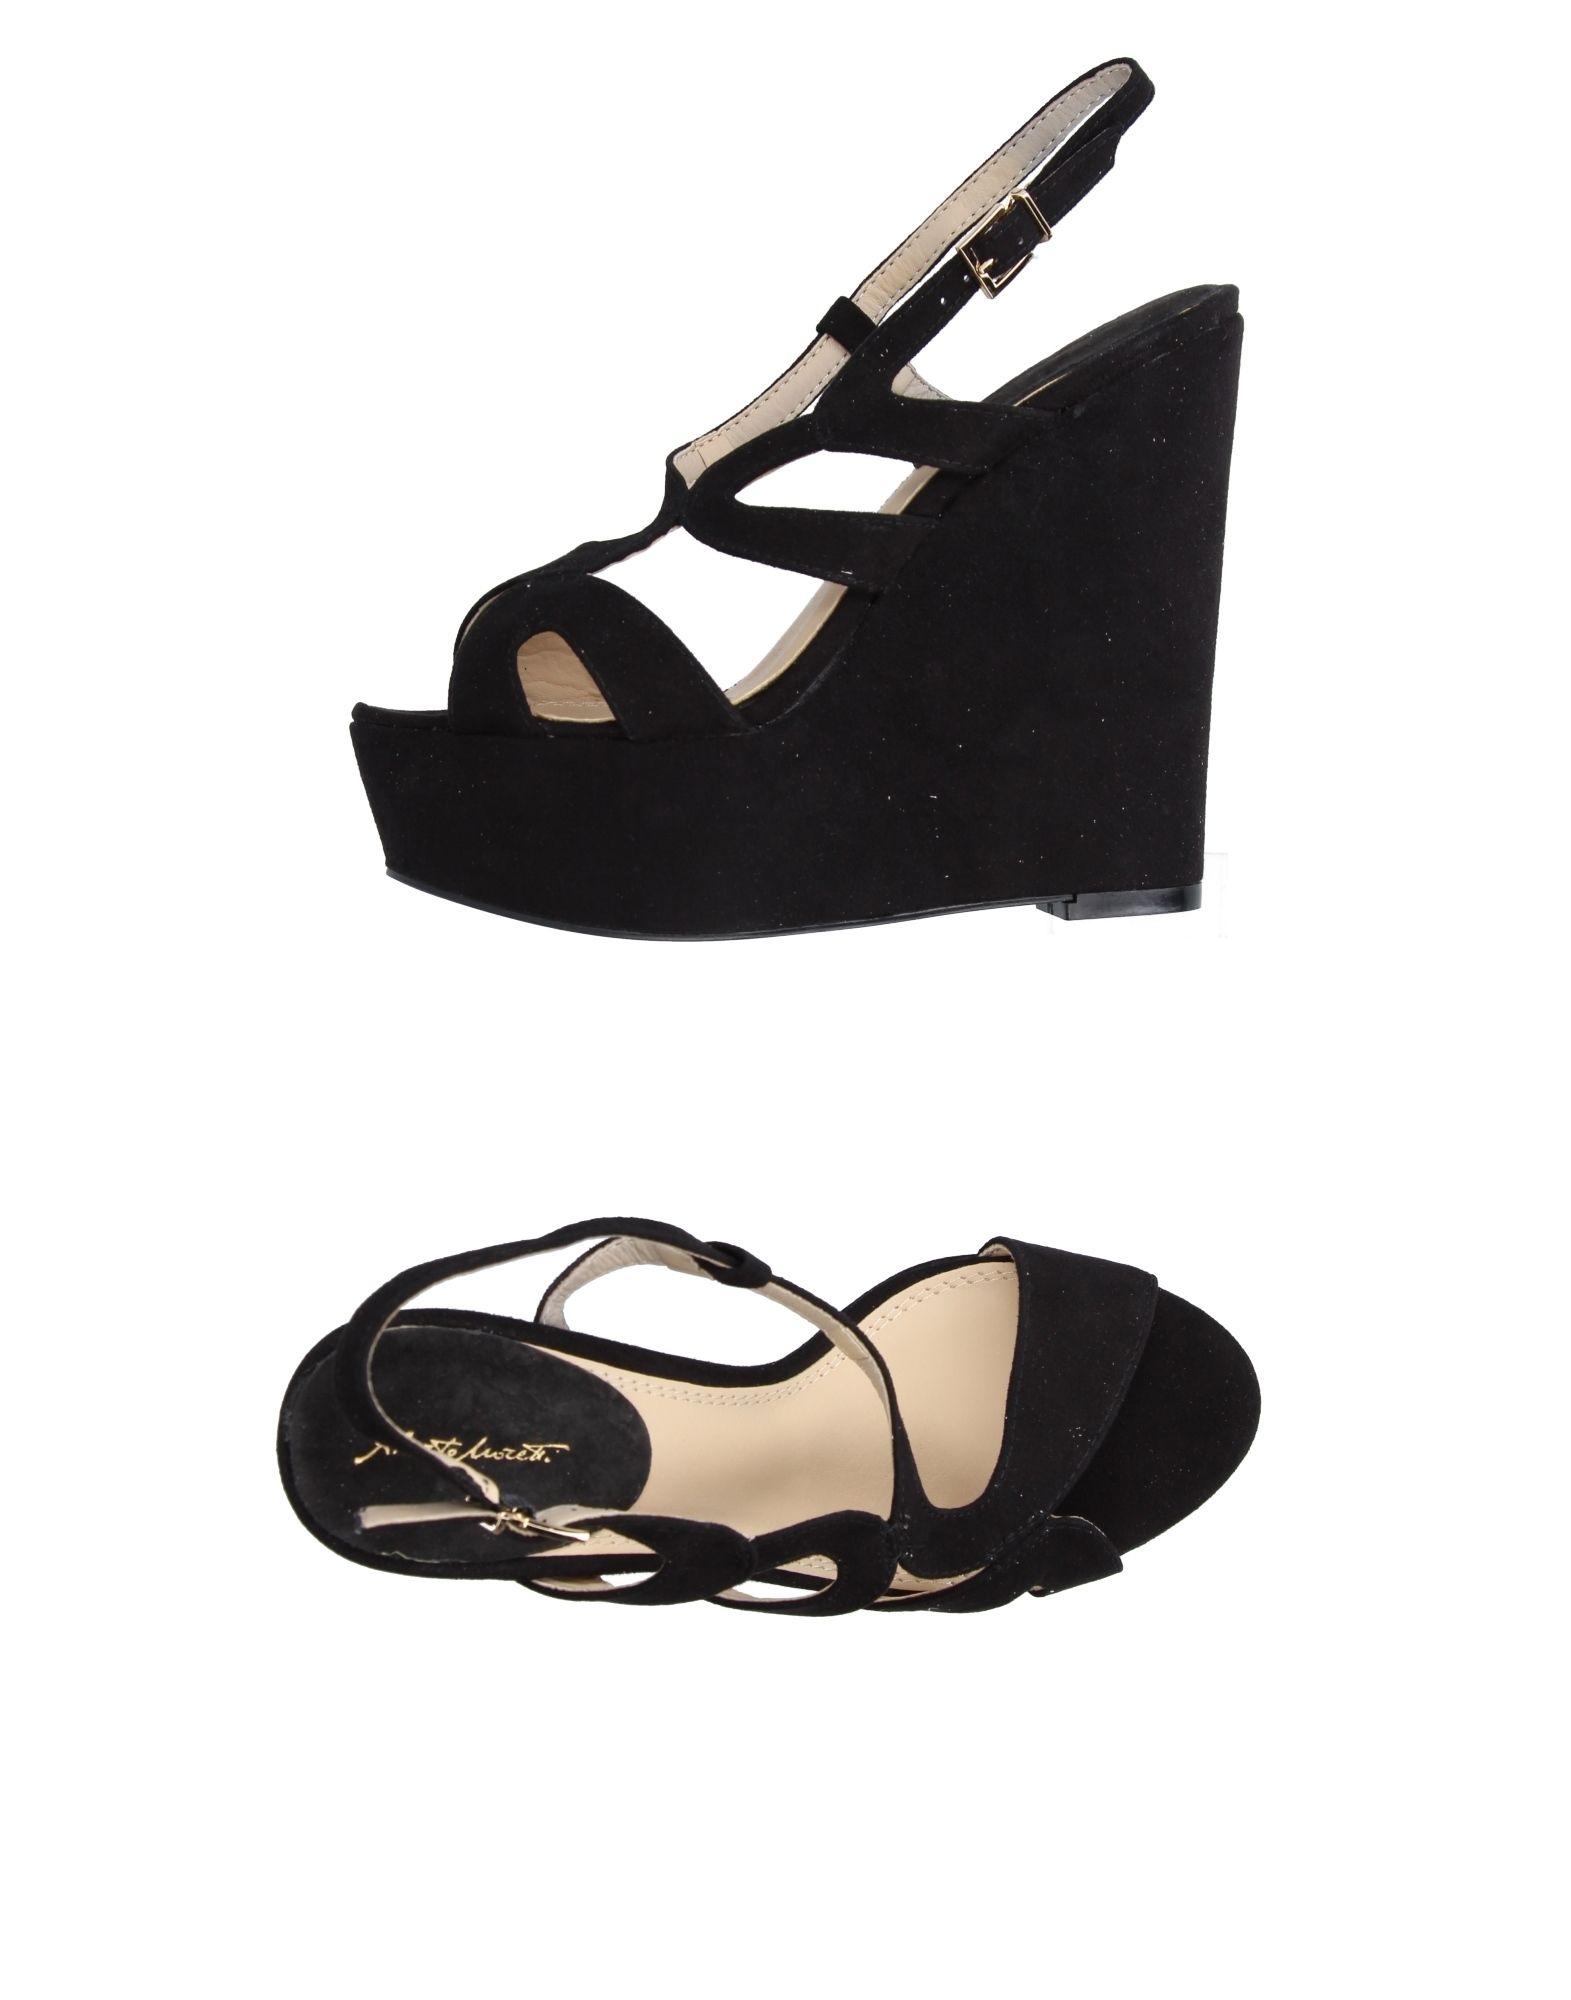 Alberto Moretti Gute Sandalen Damen  11221898KJ Gute Moretti Qualität beliebte Schuhe b68627